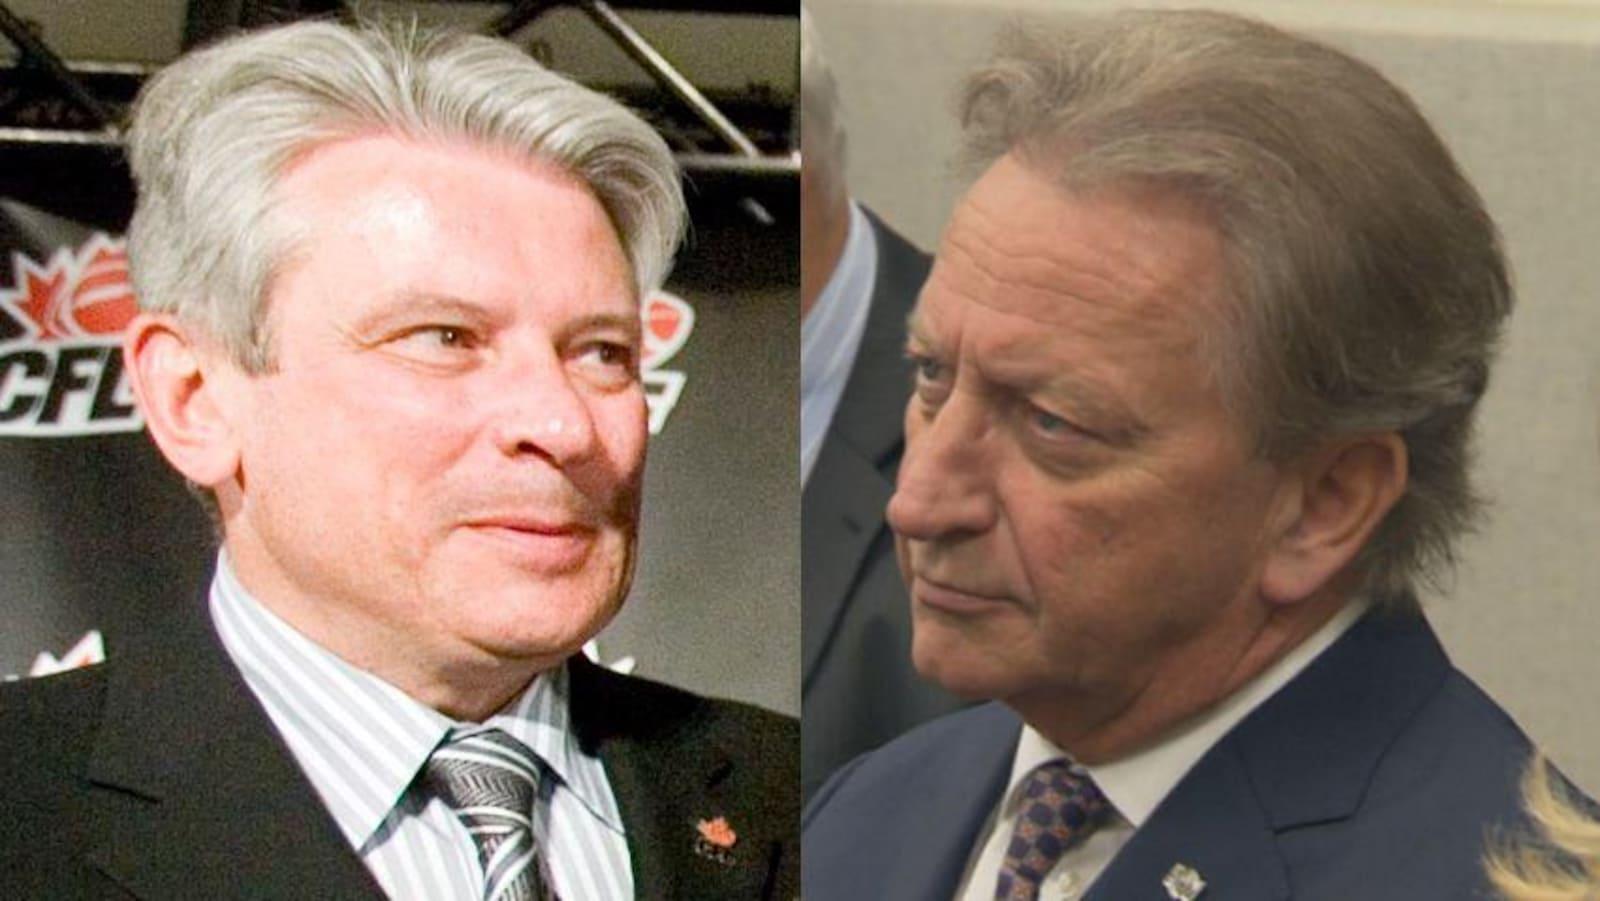 À gauche, John Ruddy et à droite, Eugene Melnyk